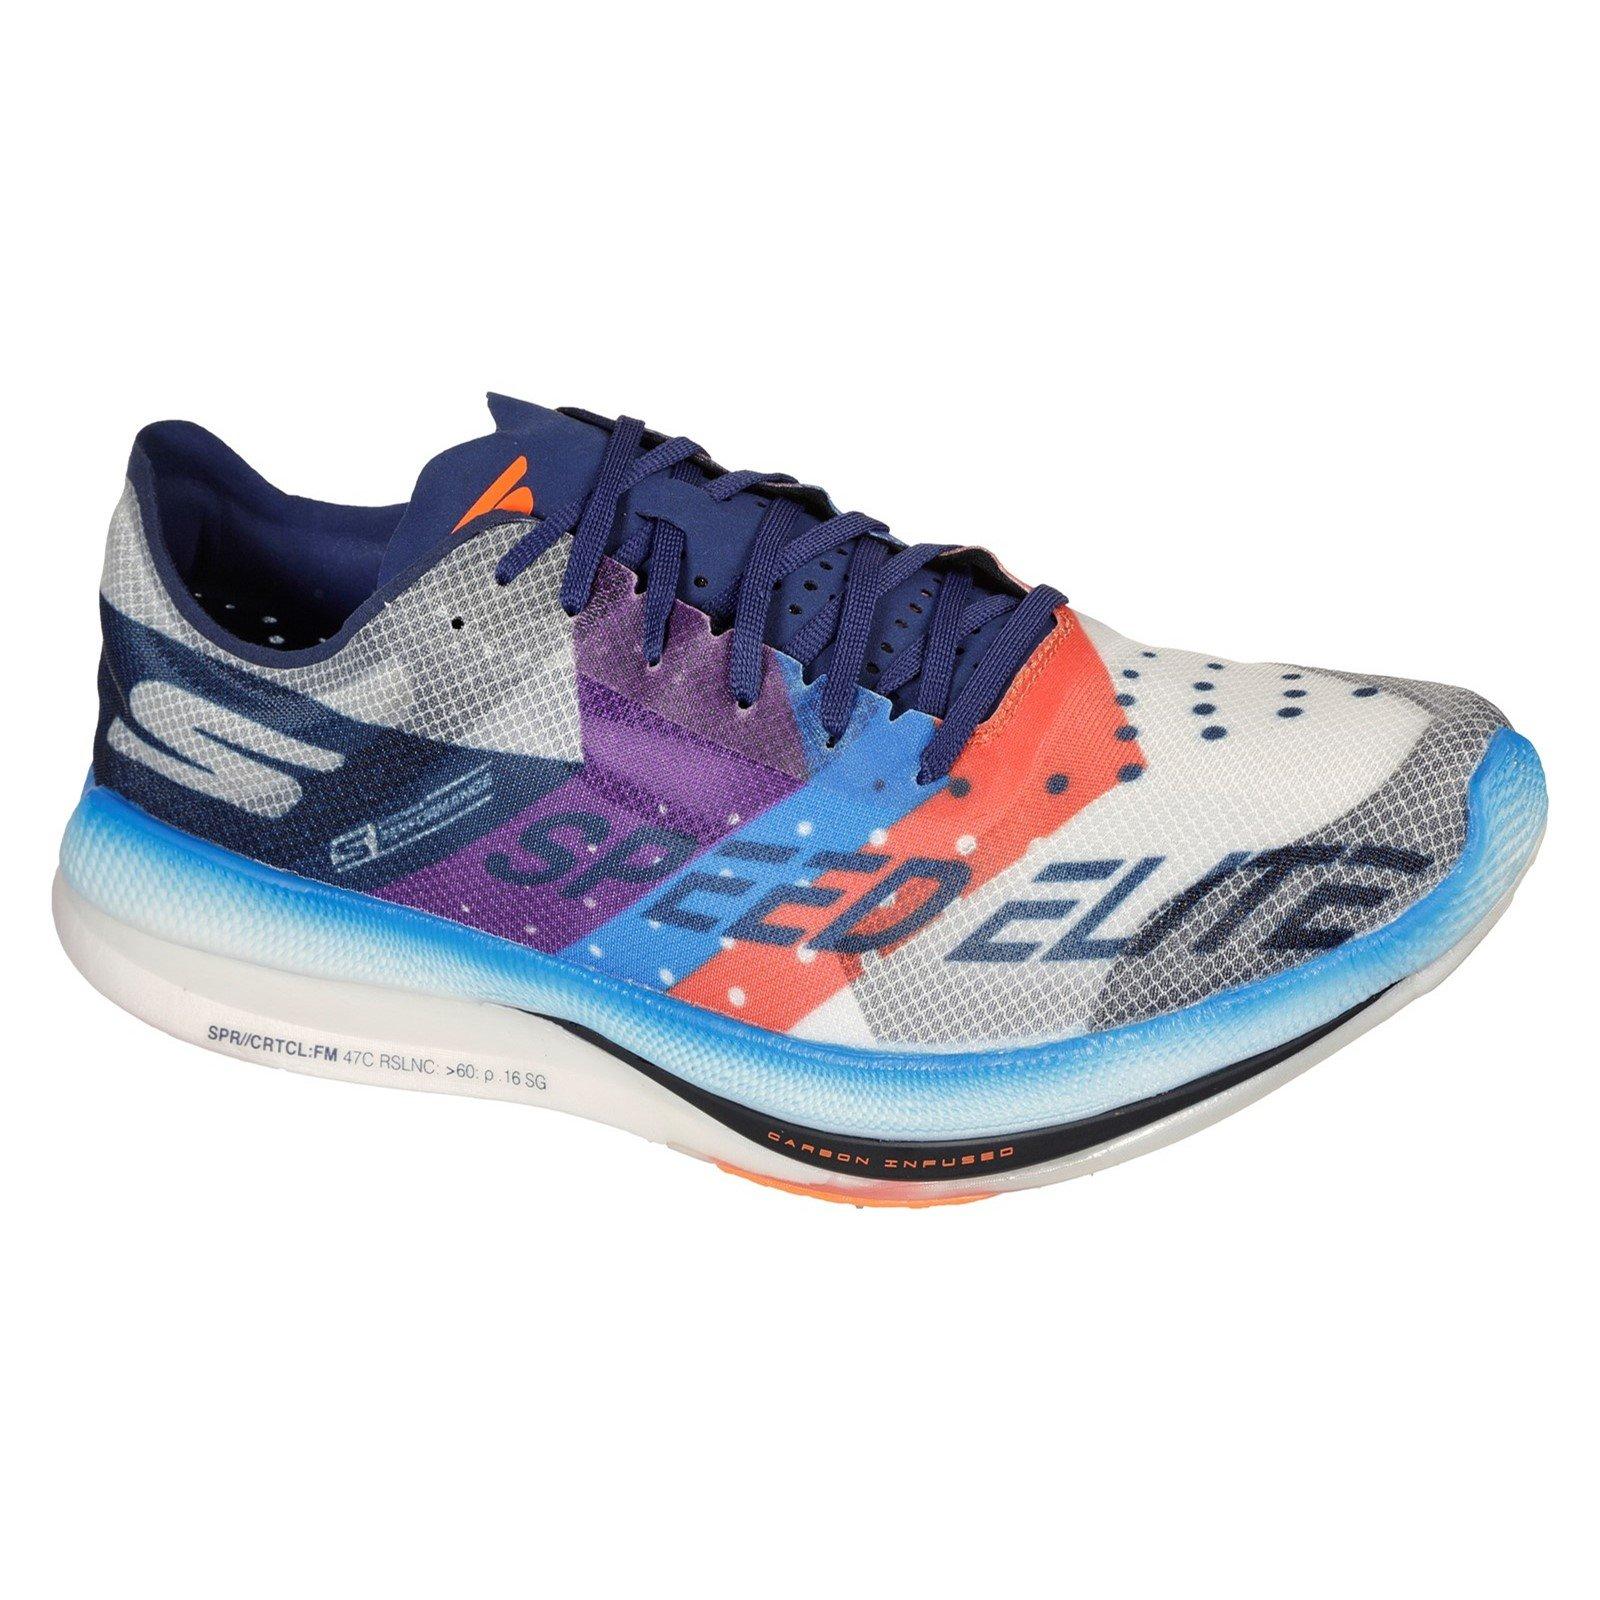 Skechers Men's Go Run Speed Elite Trainer Multicolor 32700 - White/Multi 12